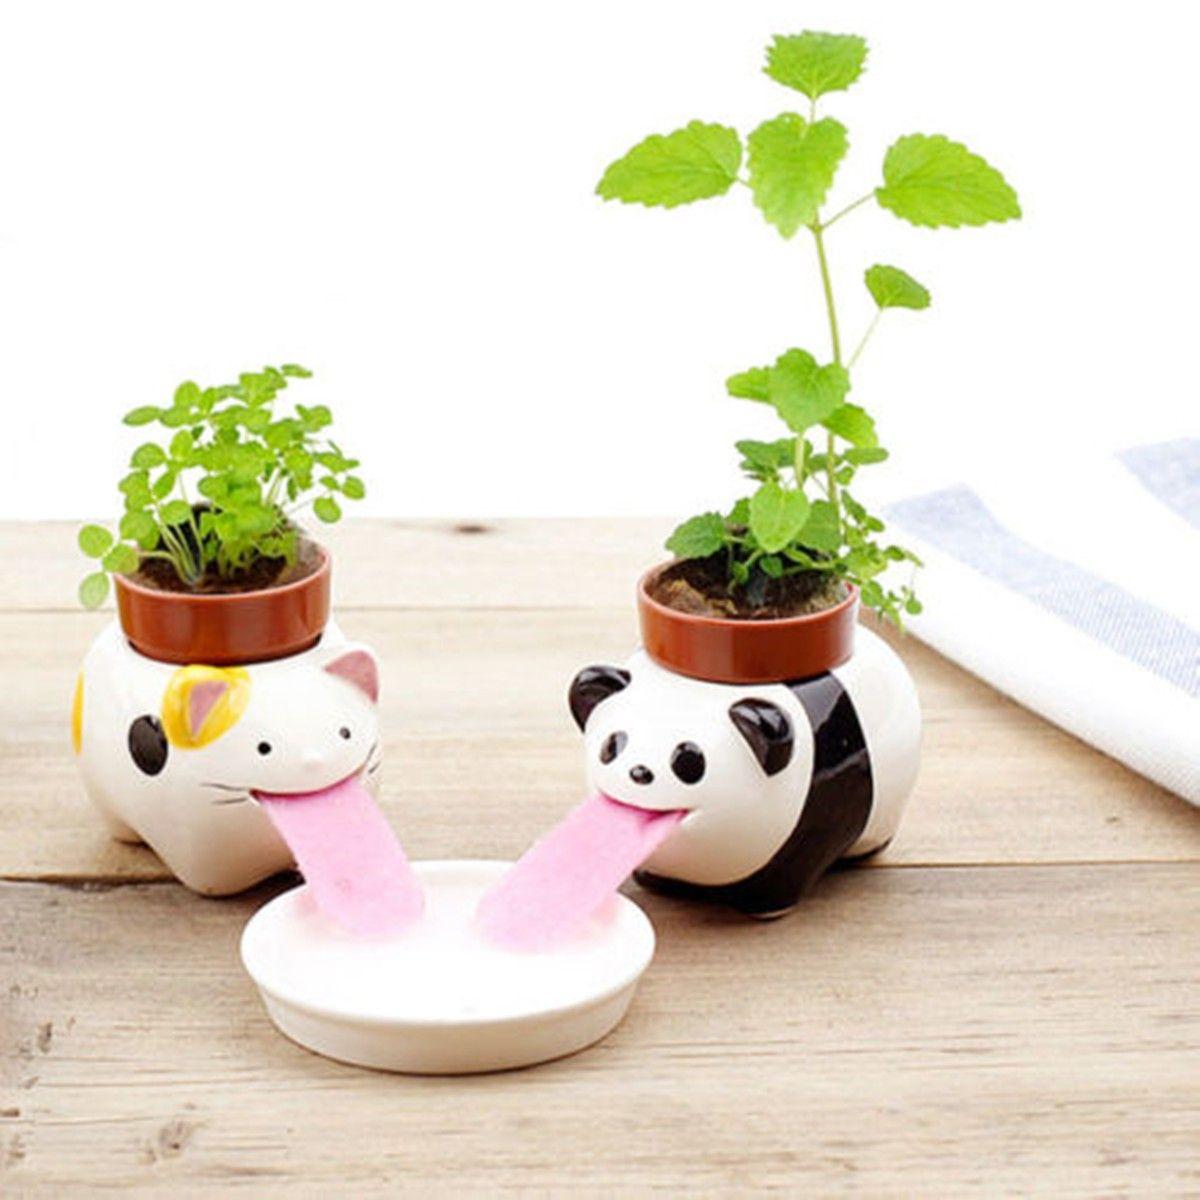 Diy mini ceramic animal tougue selfwatering potted plant